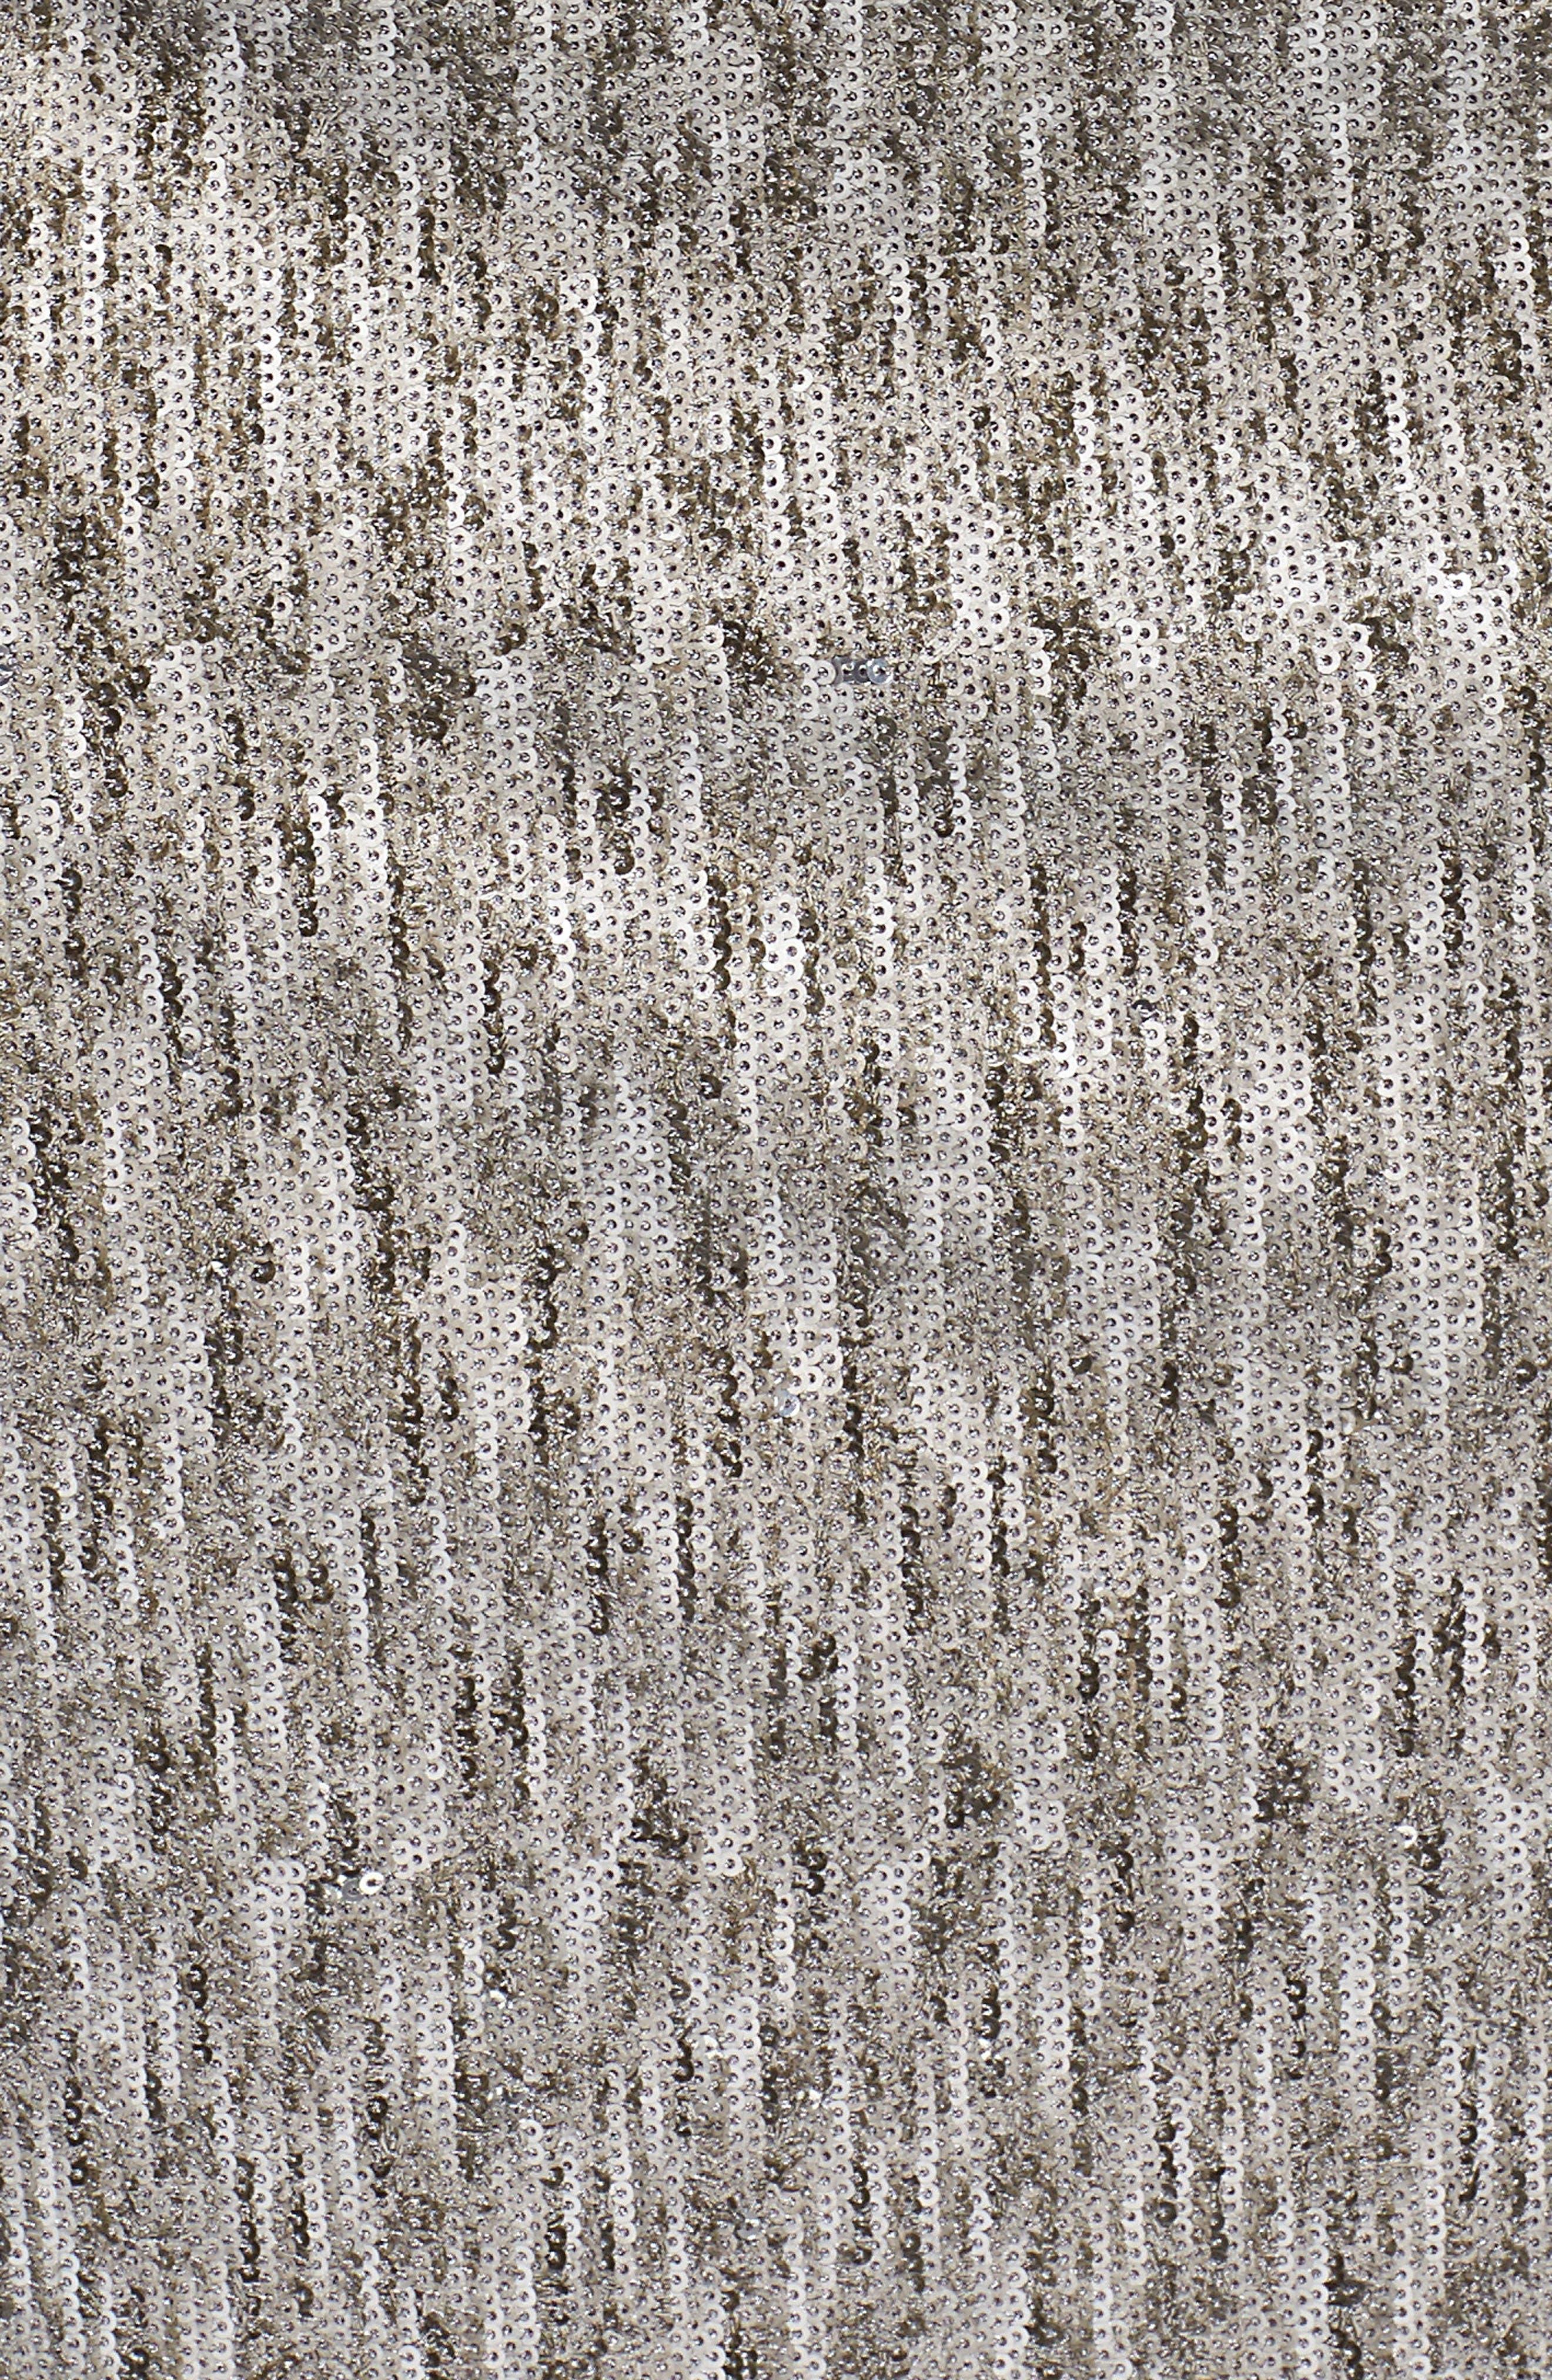 Bell Sleeve Sequin Sheath Dress,                             Alternate thumbnail 5, color,                             080